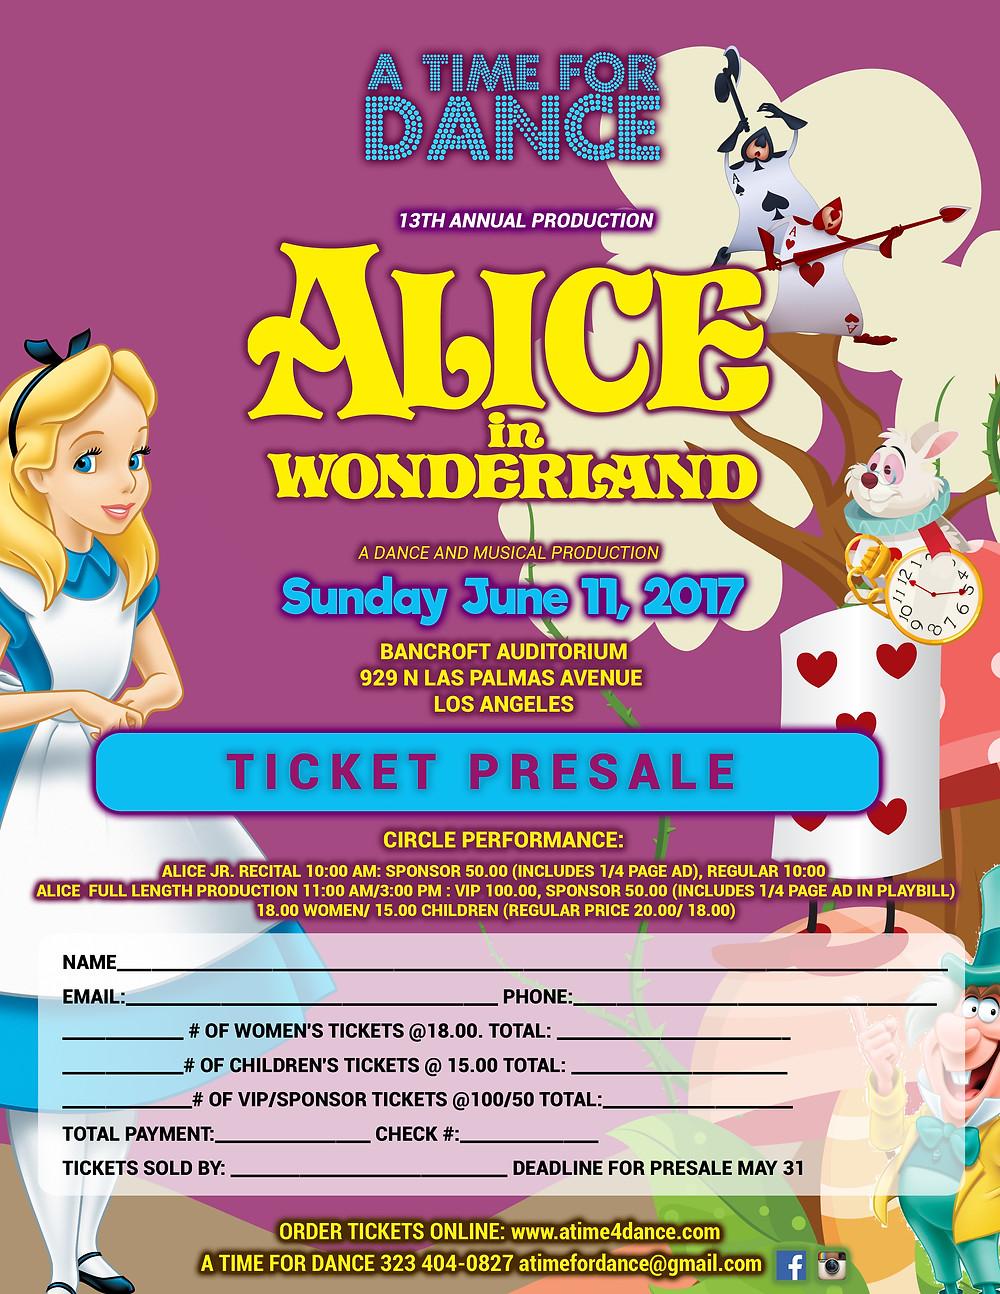 Alice in Wonderland ticket presale